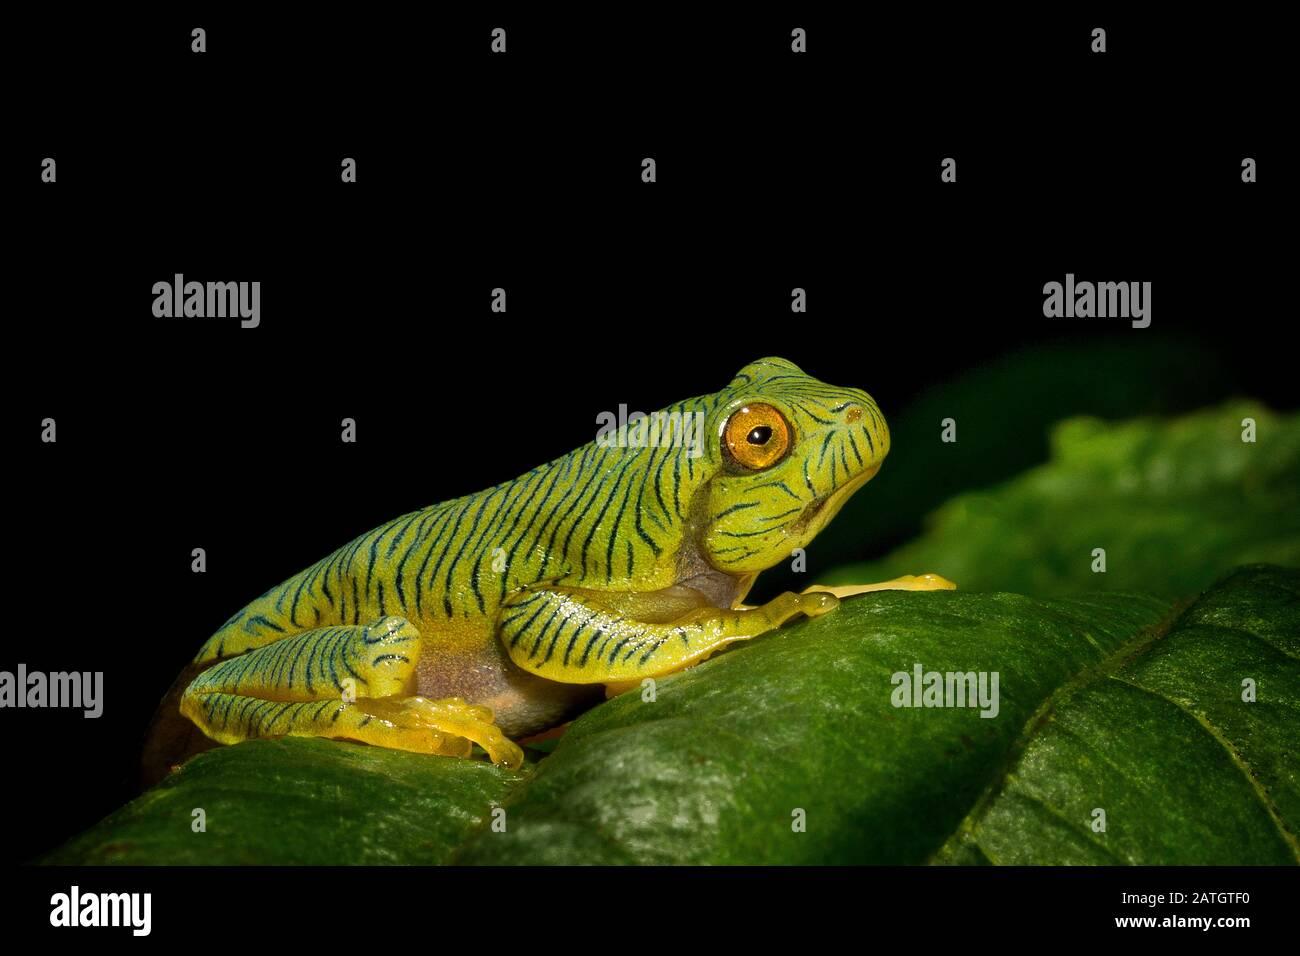 Rhacophorus pseudomalabaricus type of flying frog endemic to the Anaimalai Hills of Tamil Nadu and Kerala states, India. Stock Photo